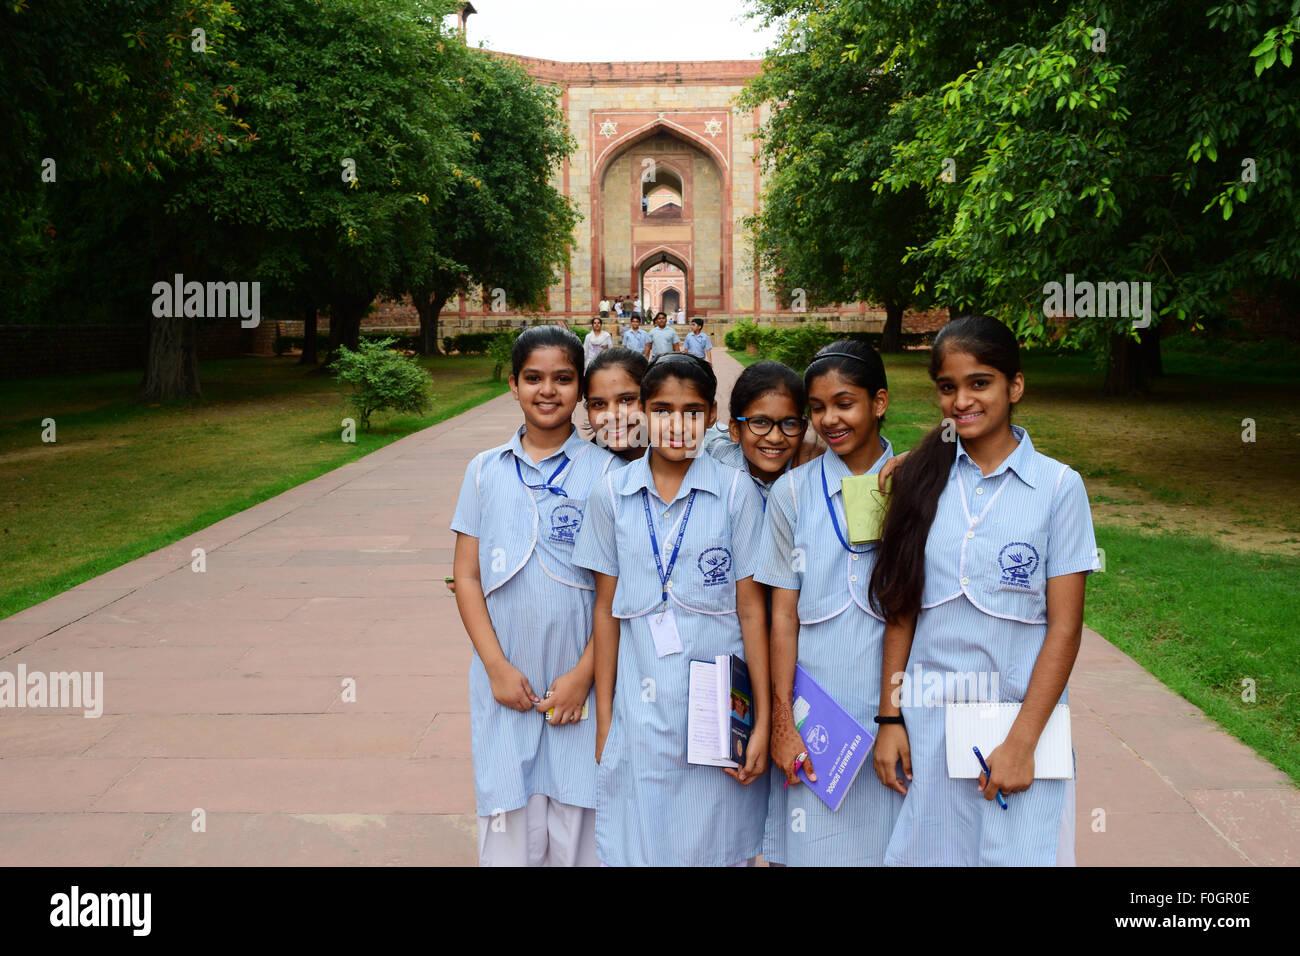 ILSC New Delhi - Study English, French or Hindi in India